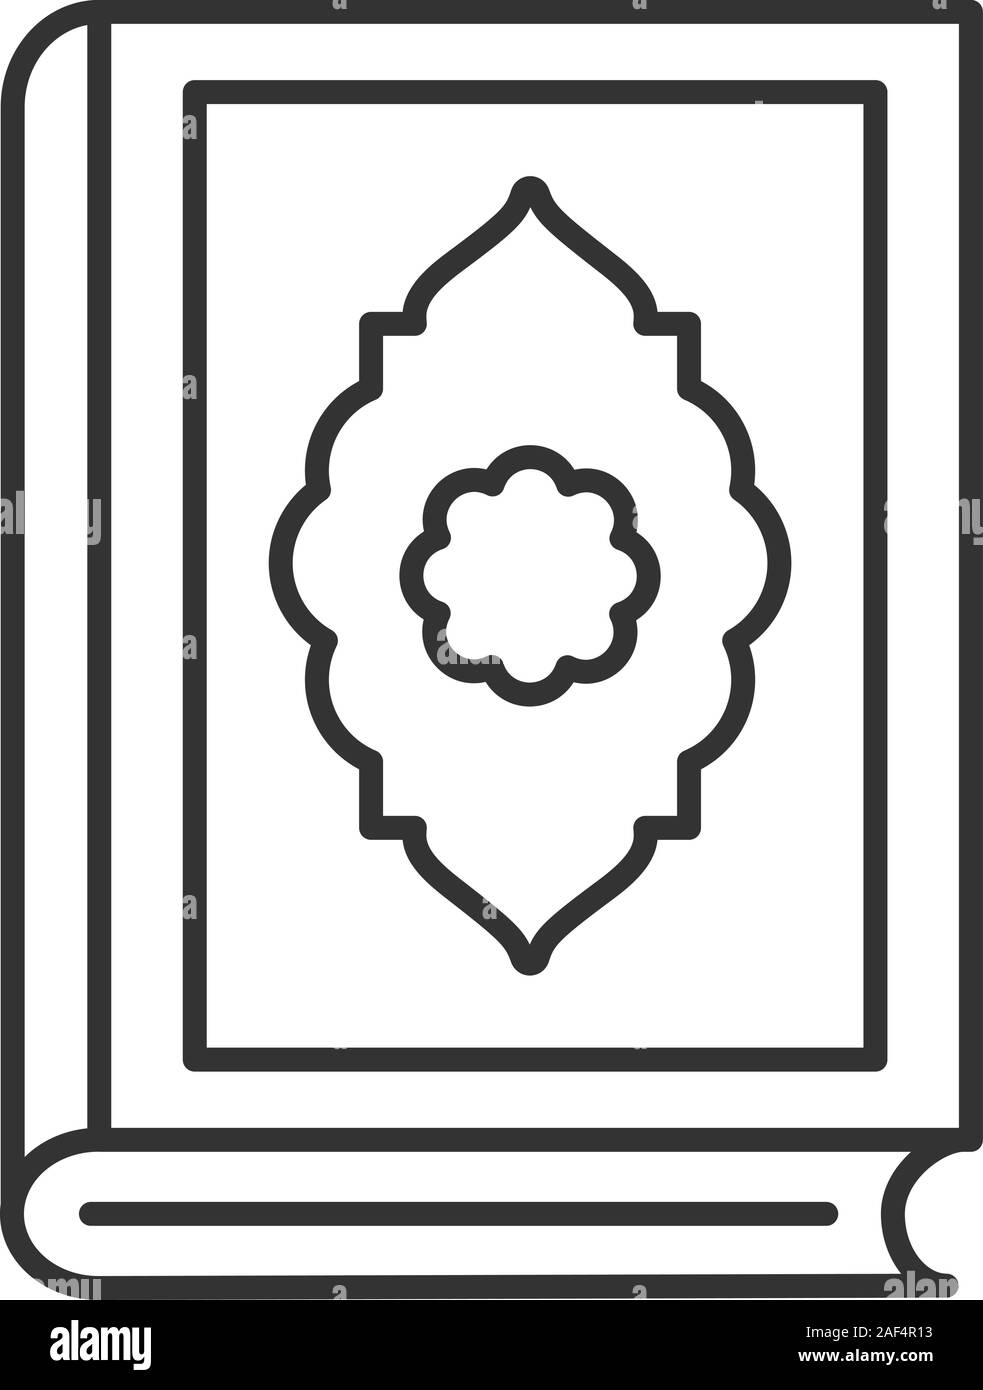 Logo Quran Vector : quran, vector, Quran, Linear, Icon., Illustration., Islamic, Religion., Koran., Contour, Symbol., Vector, Isolated, Outline, Drawing, Stock, Image, Alamy